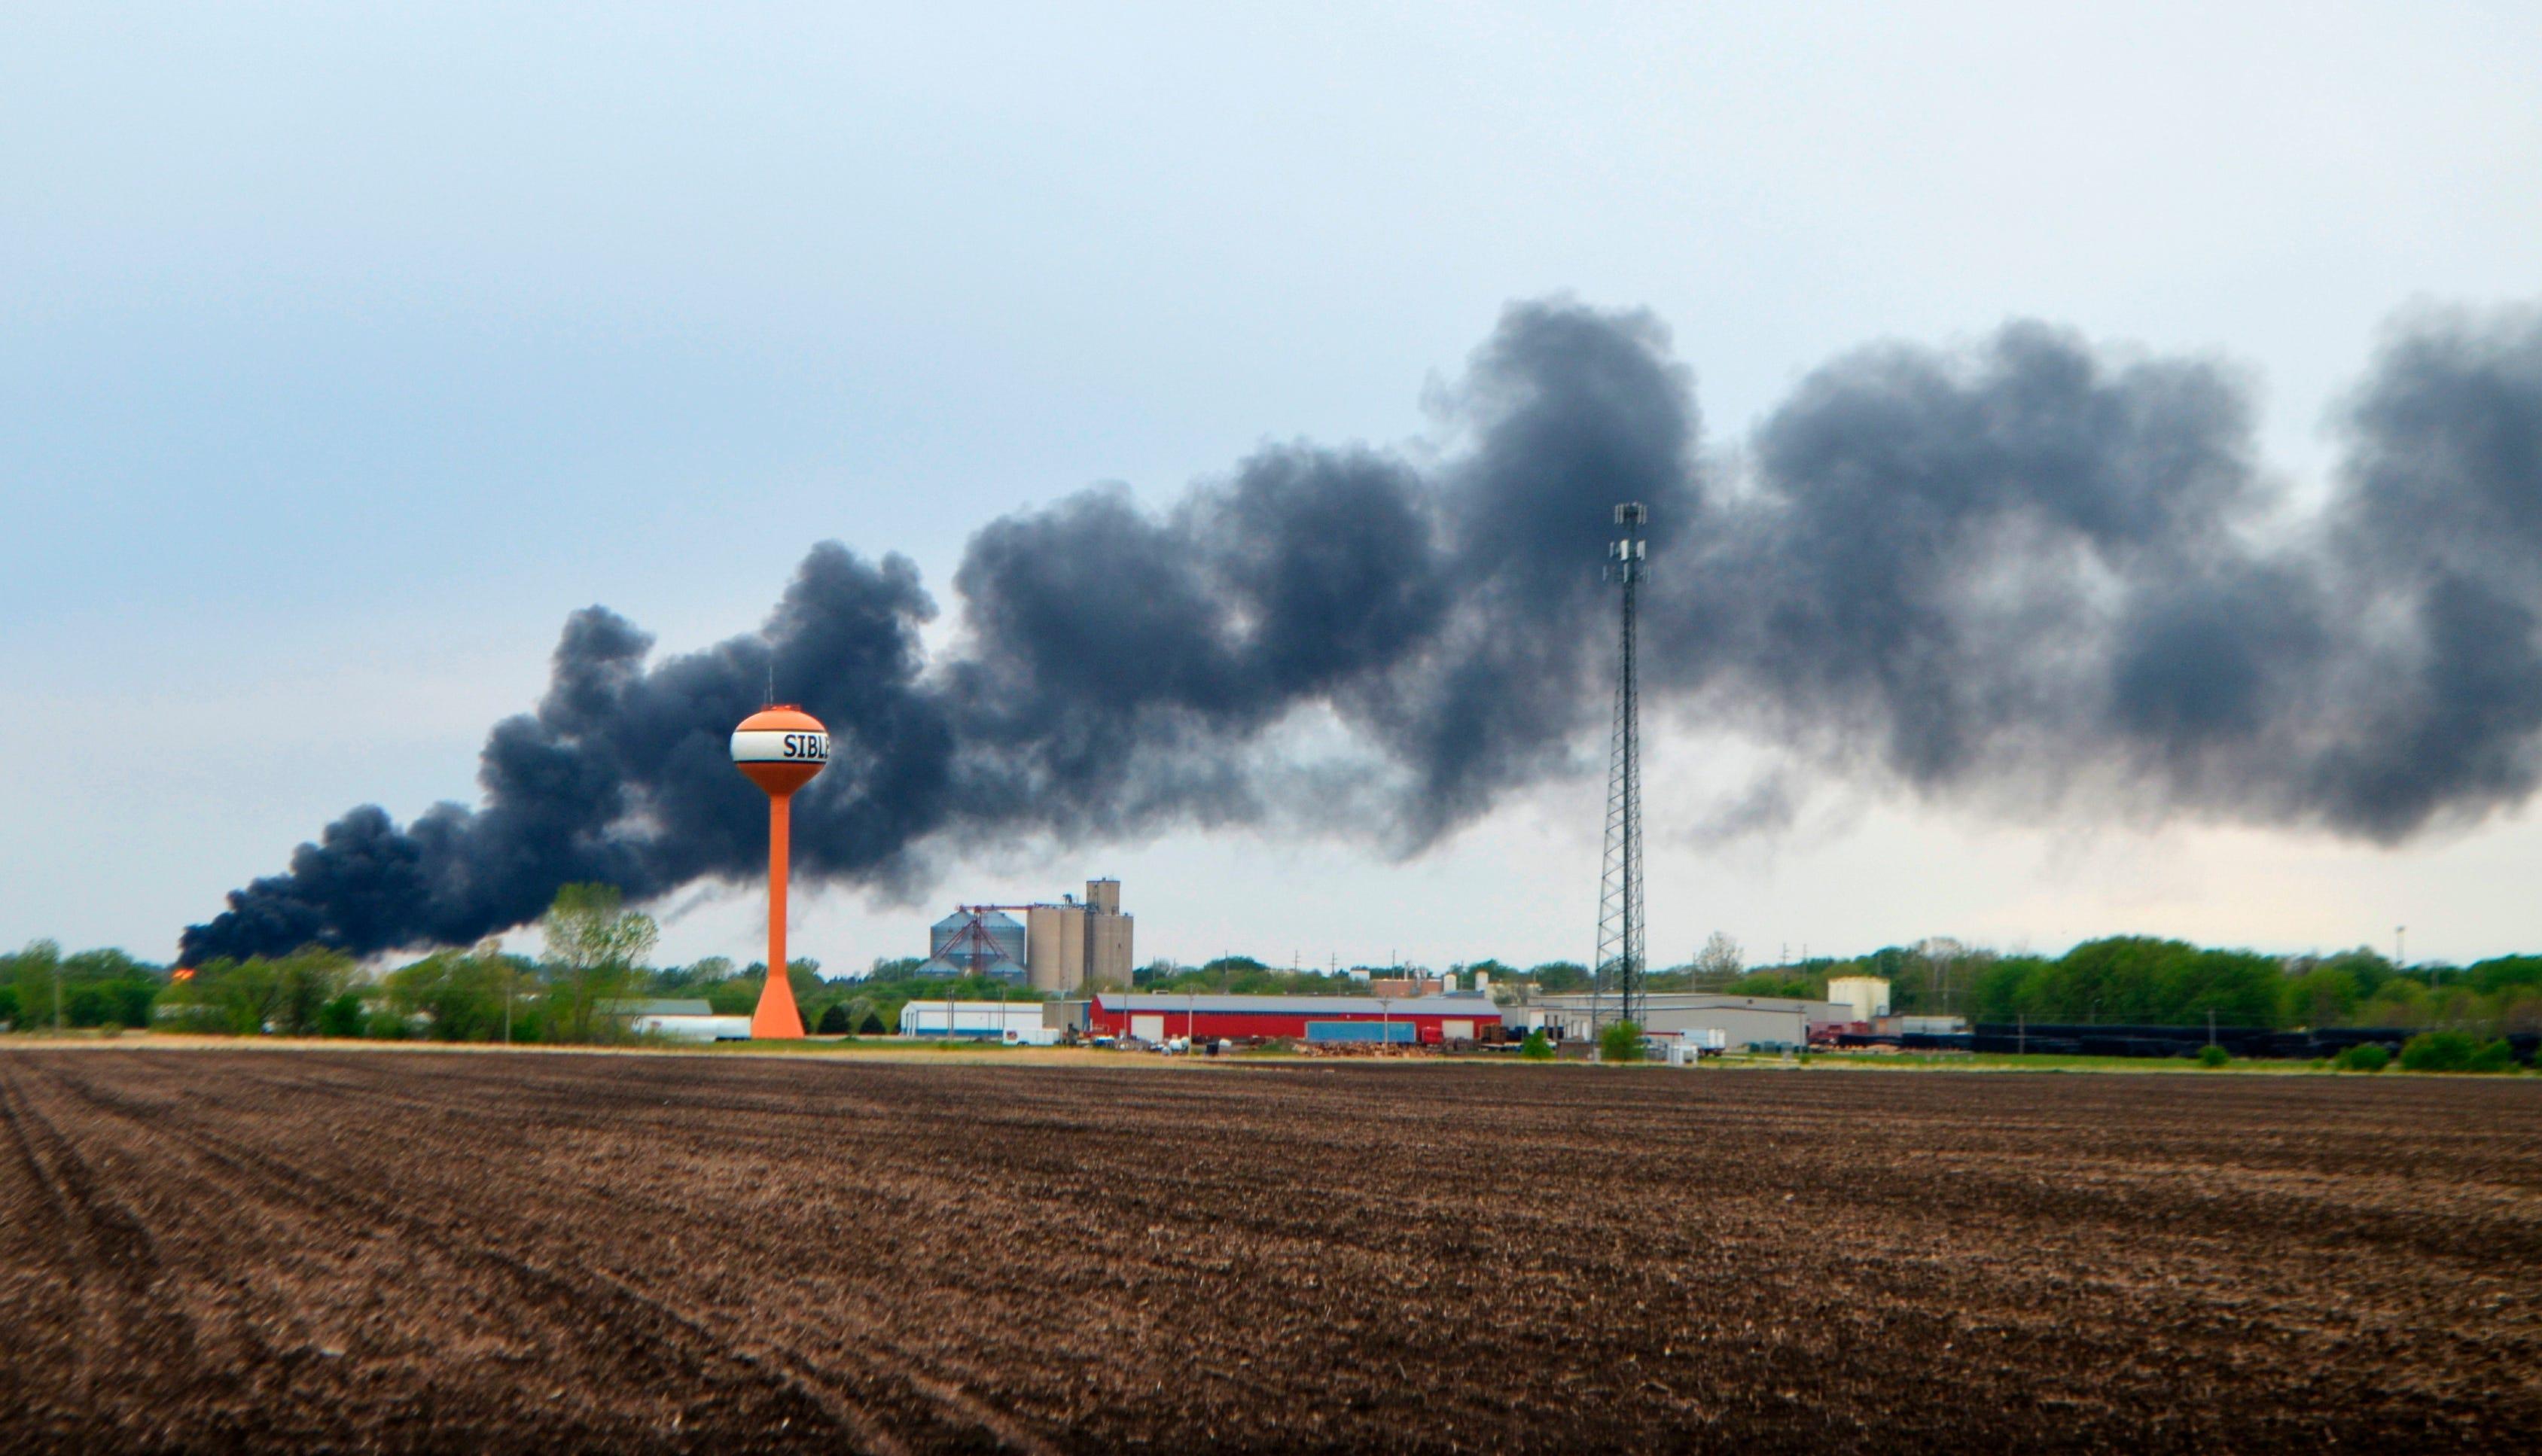 Fiery train derailment prompts evacuation of small Iowa town 2